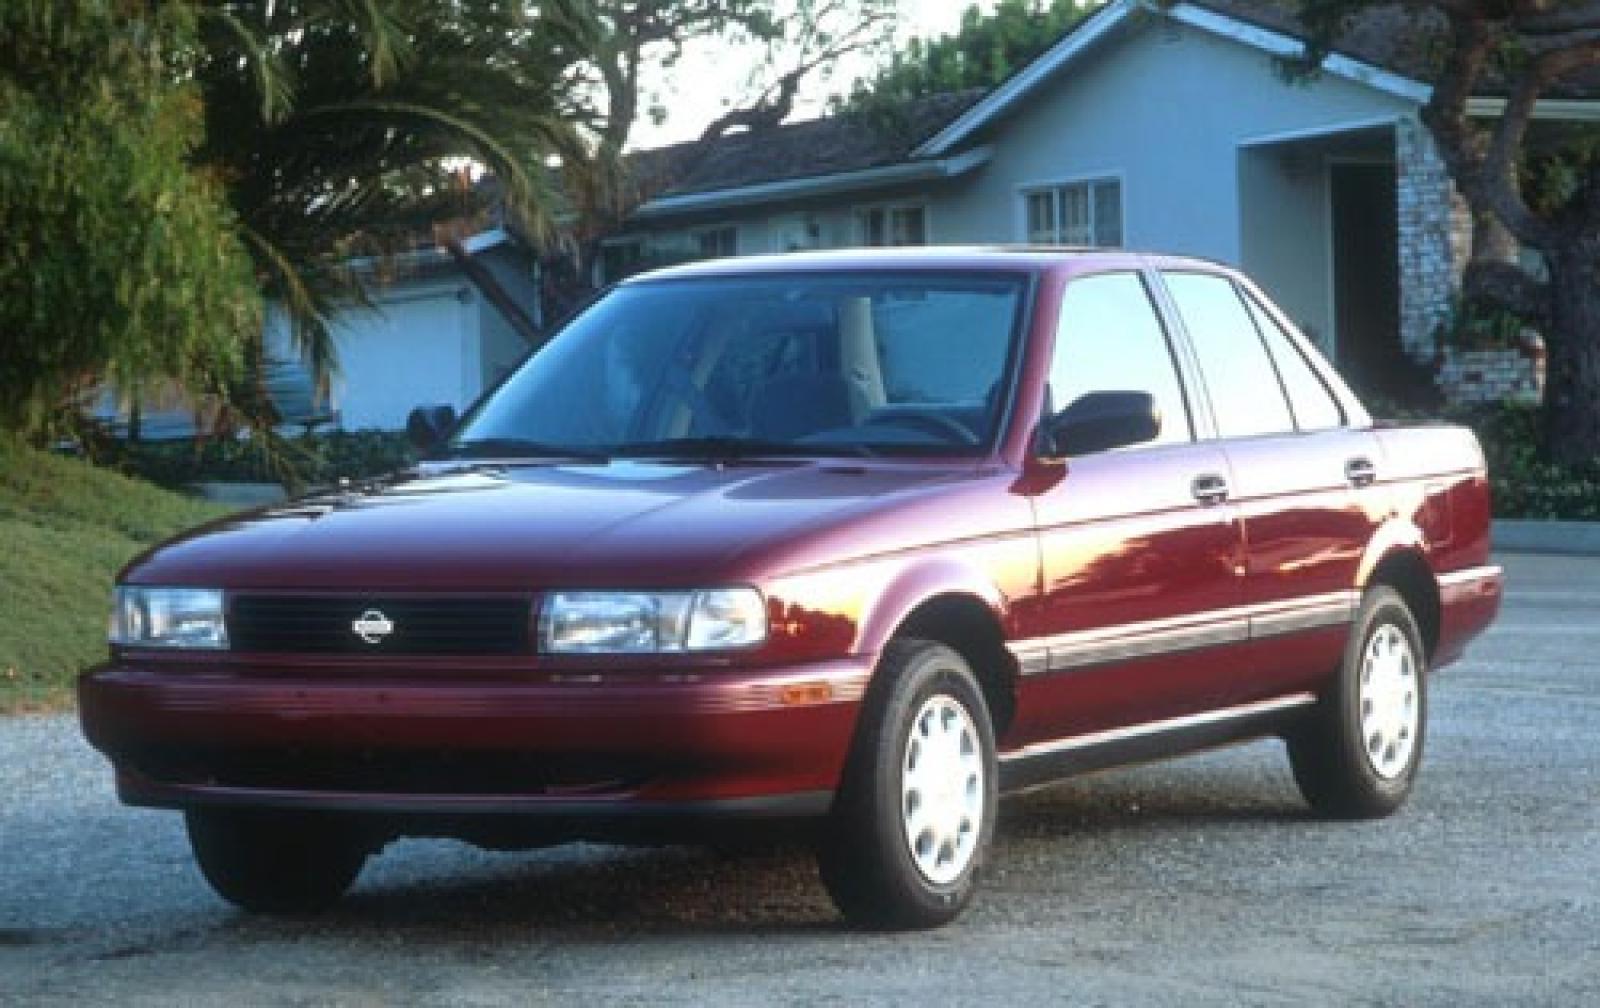 1994 Nissan Sentra - Information and photos - Zomb Drive